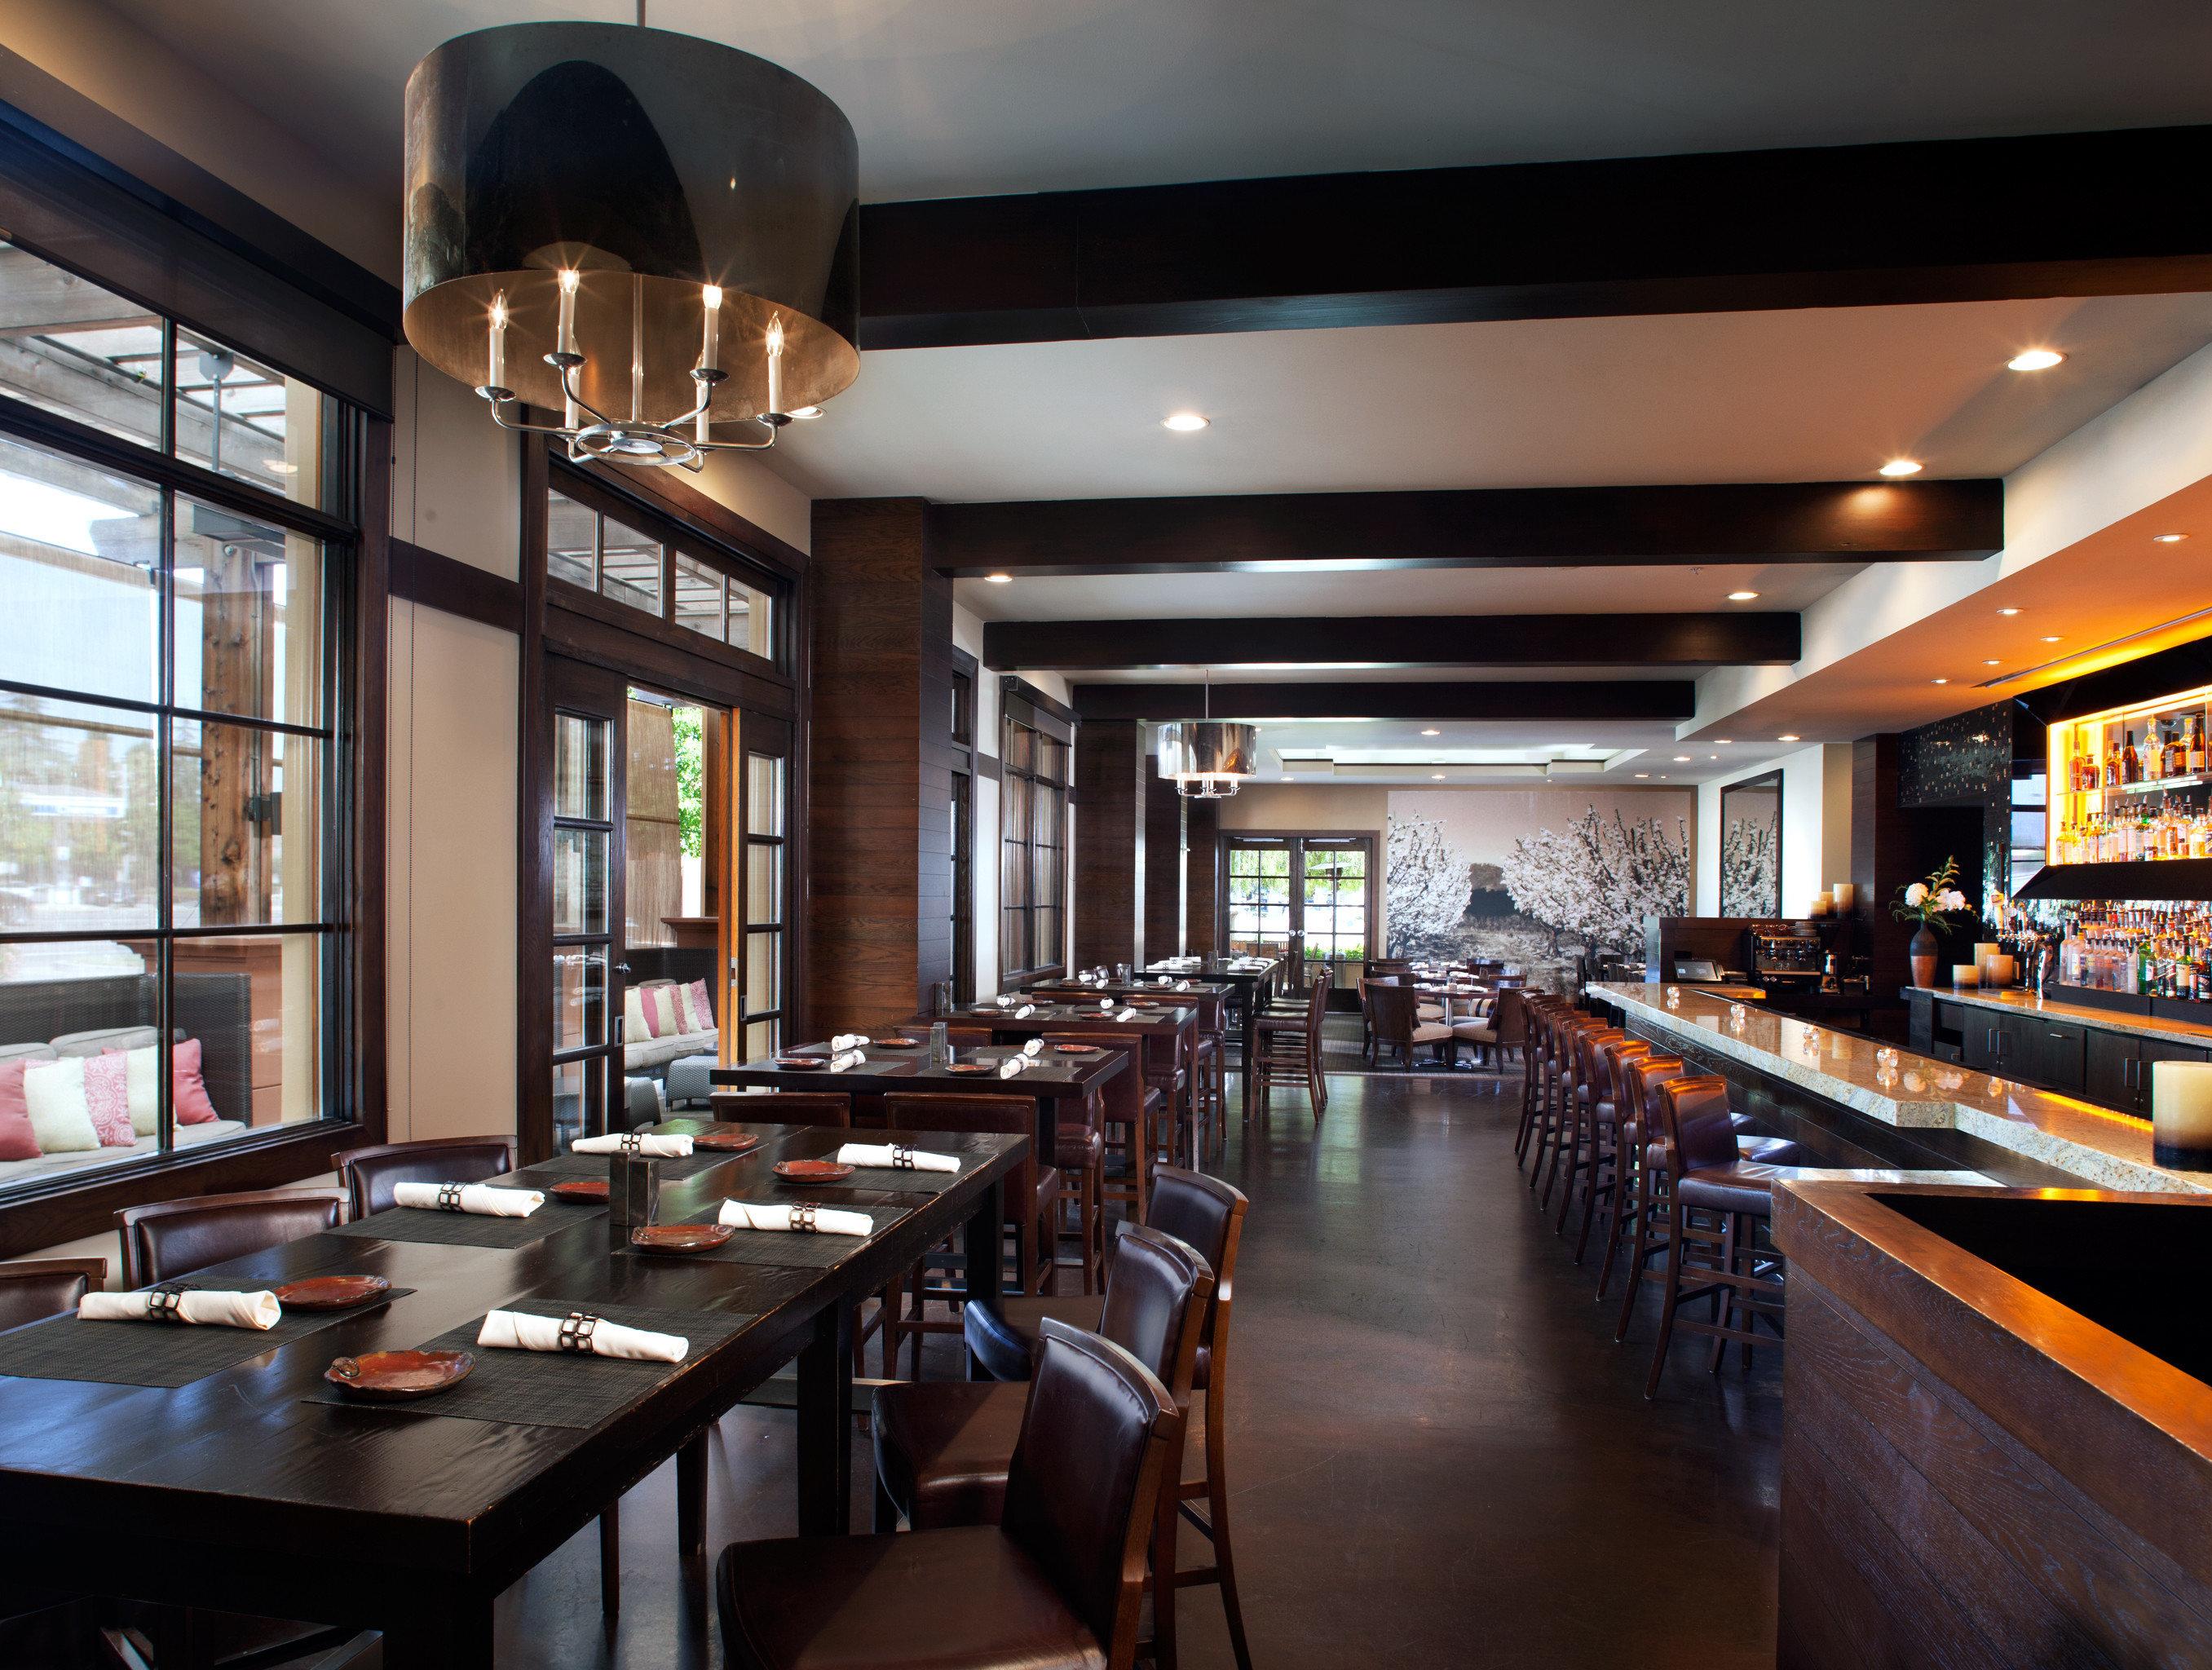 Cultural Dining Drink Eat Modern restaurant cafeteria café Bar food court coffeehouse Island